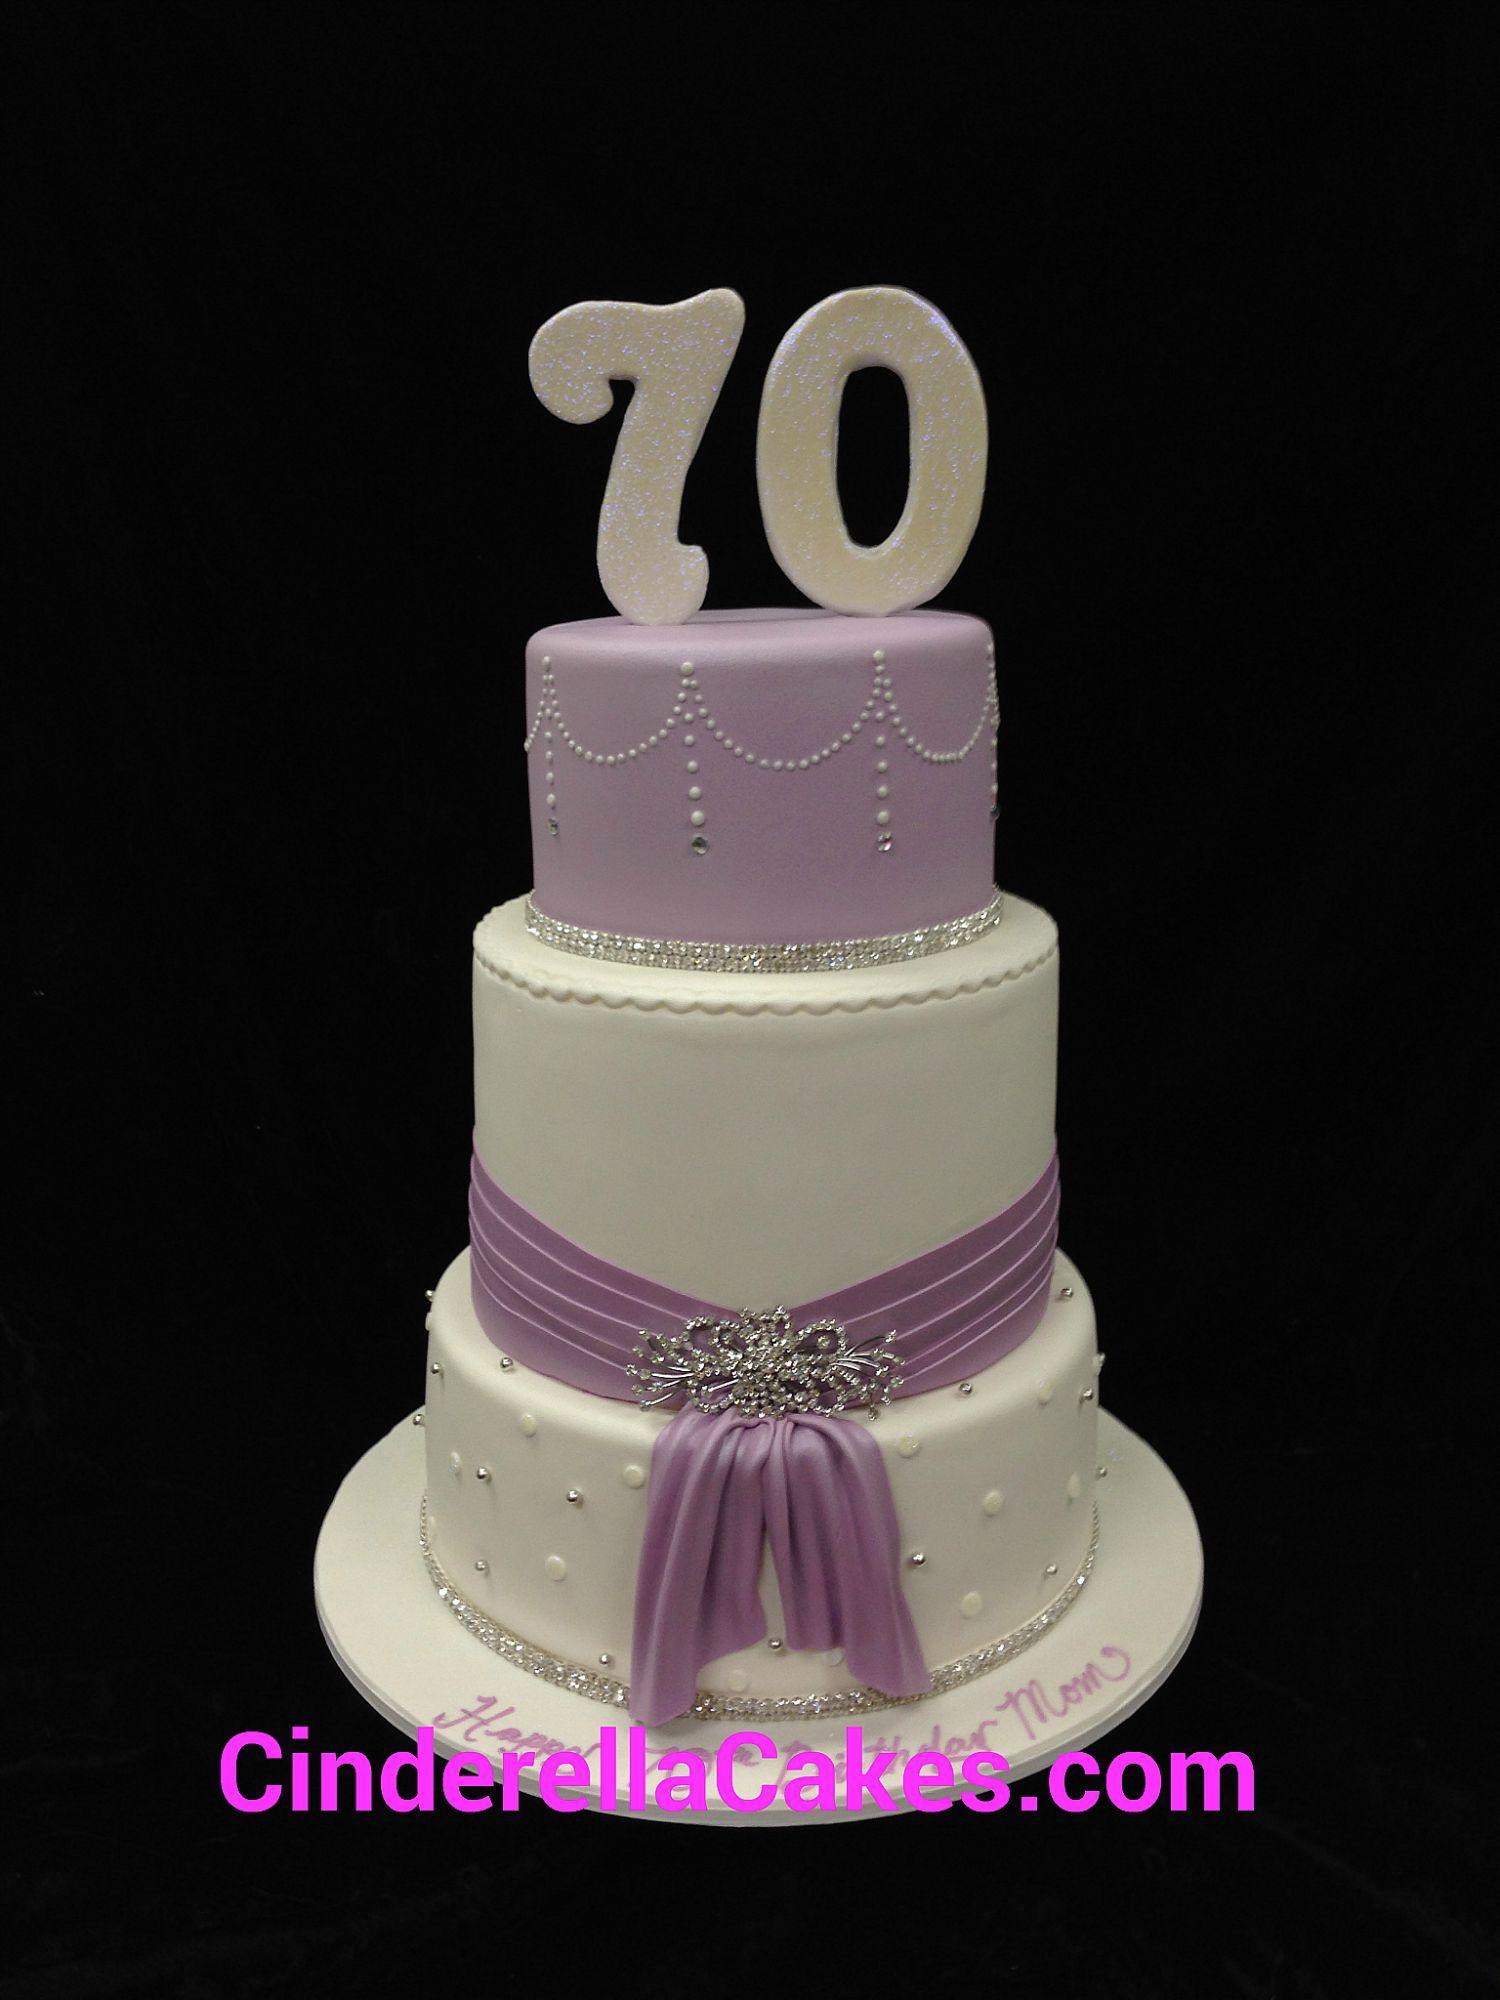 A beautiful fondant cake to celebrate a monumental